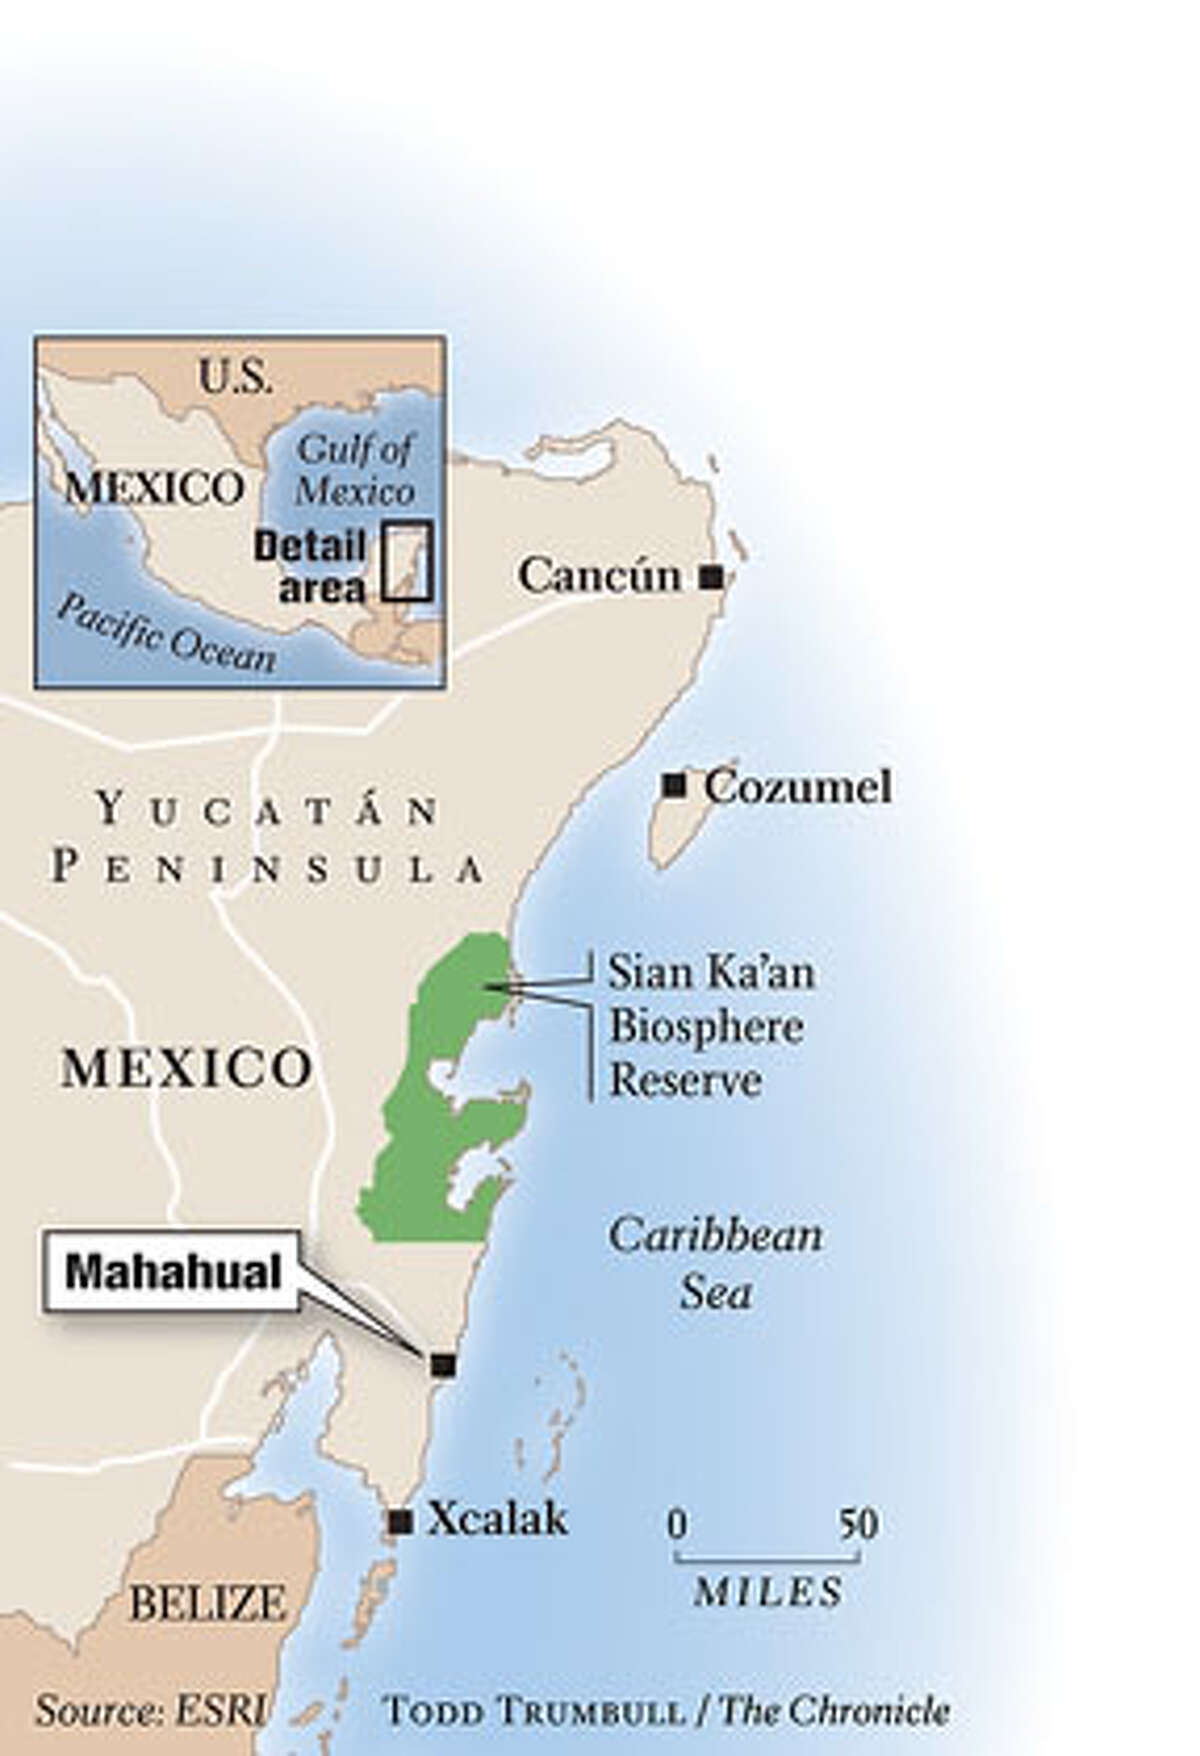 Yucatan Peninsula. Chronicle graphic by Todd Trumbull